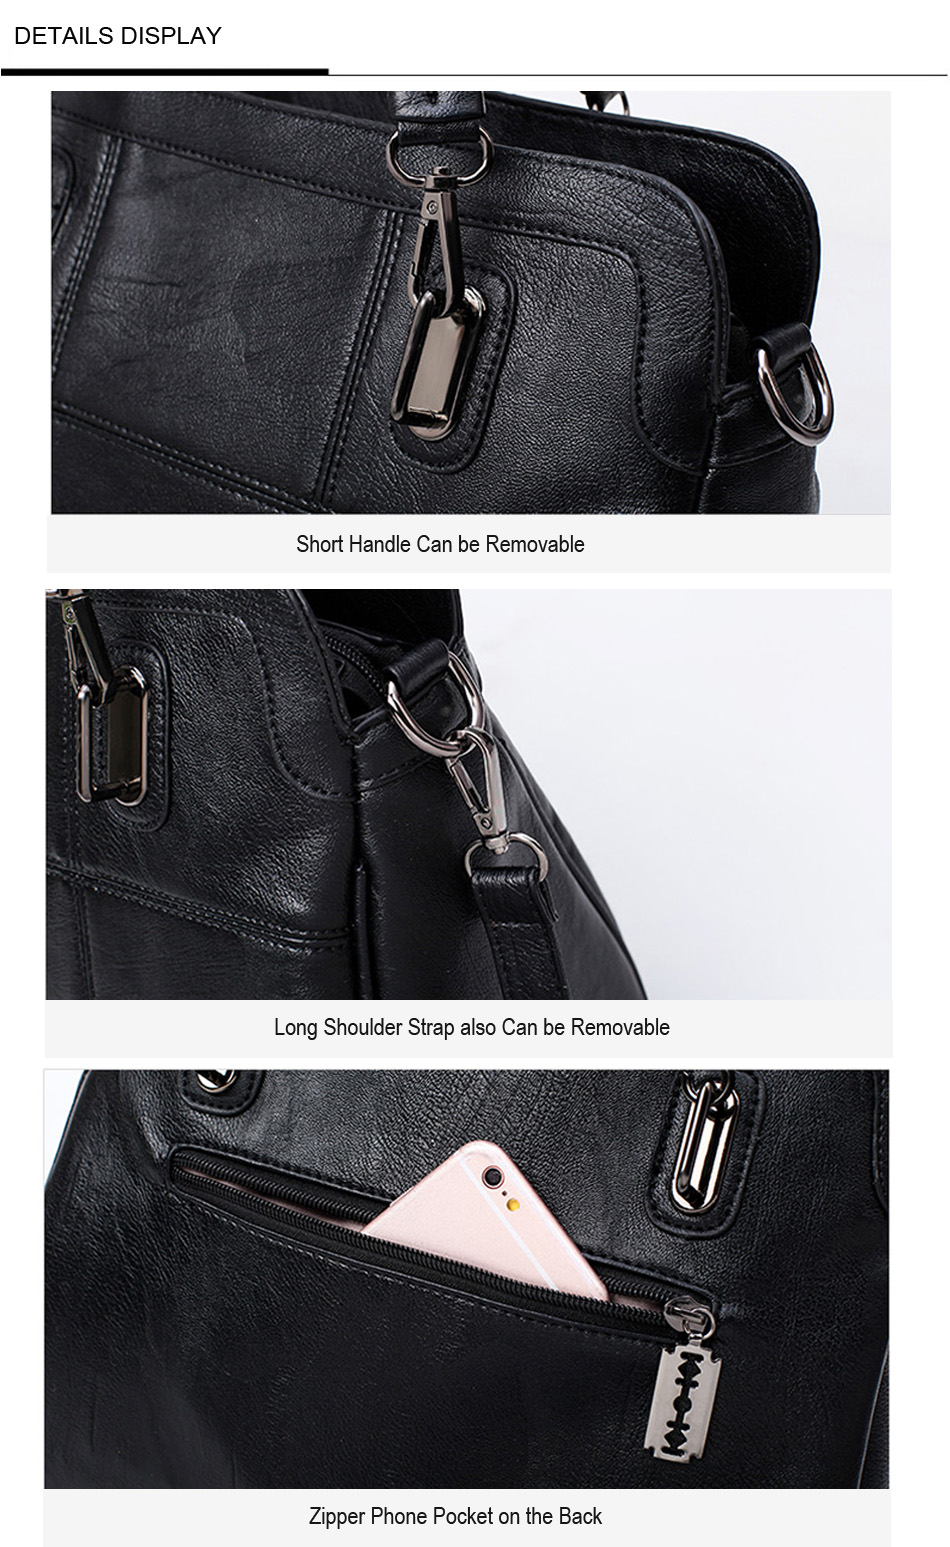 Bonsacchic Fashion Ladies Hand Bag Women's Genuine Leather Handbag Black Leather Tote Bag Bolsas femininas Female Shoulder Bag 6